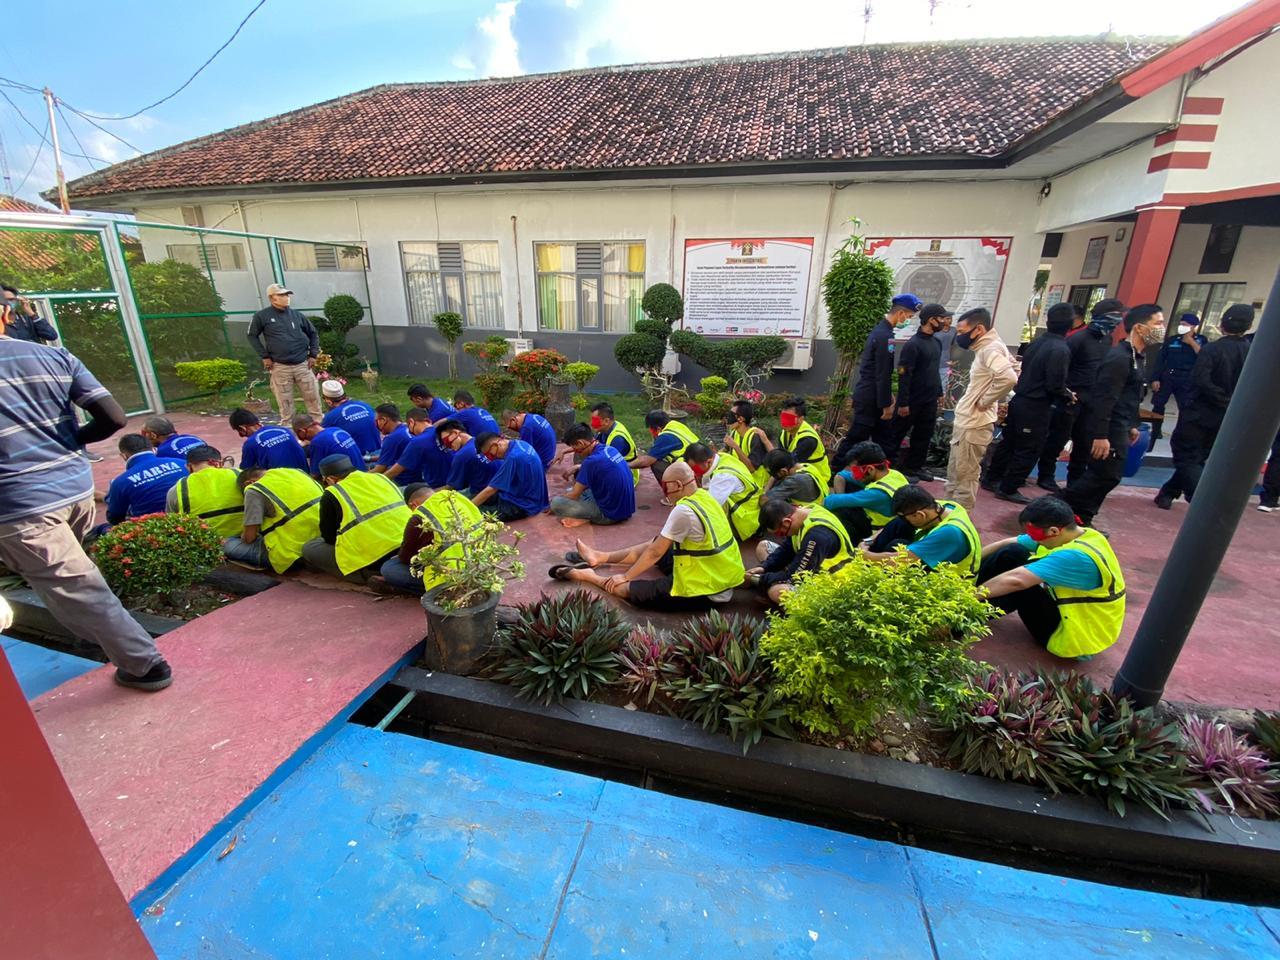 - Sebanyak lima belas (15) Narapidana warga binaan Lapas Kelas IIA Karawang Jawa Barat dipindahkan ke Lembaga Pemasyarakatan Narkotika Kelas IIA Nusakambangan.